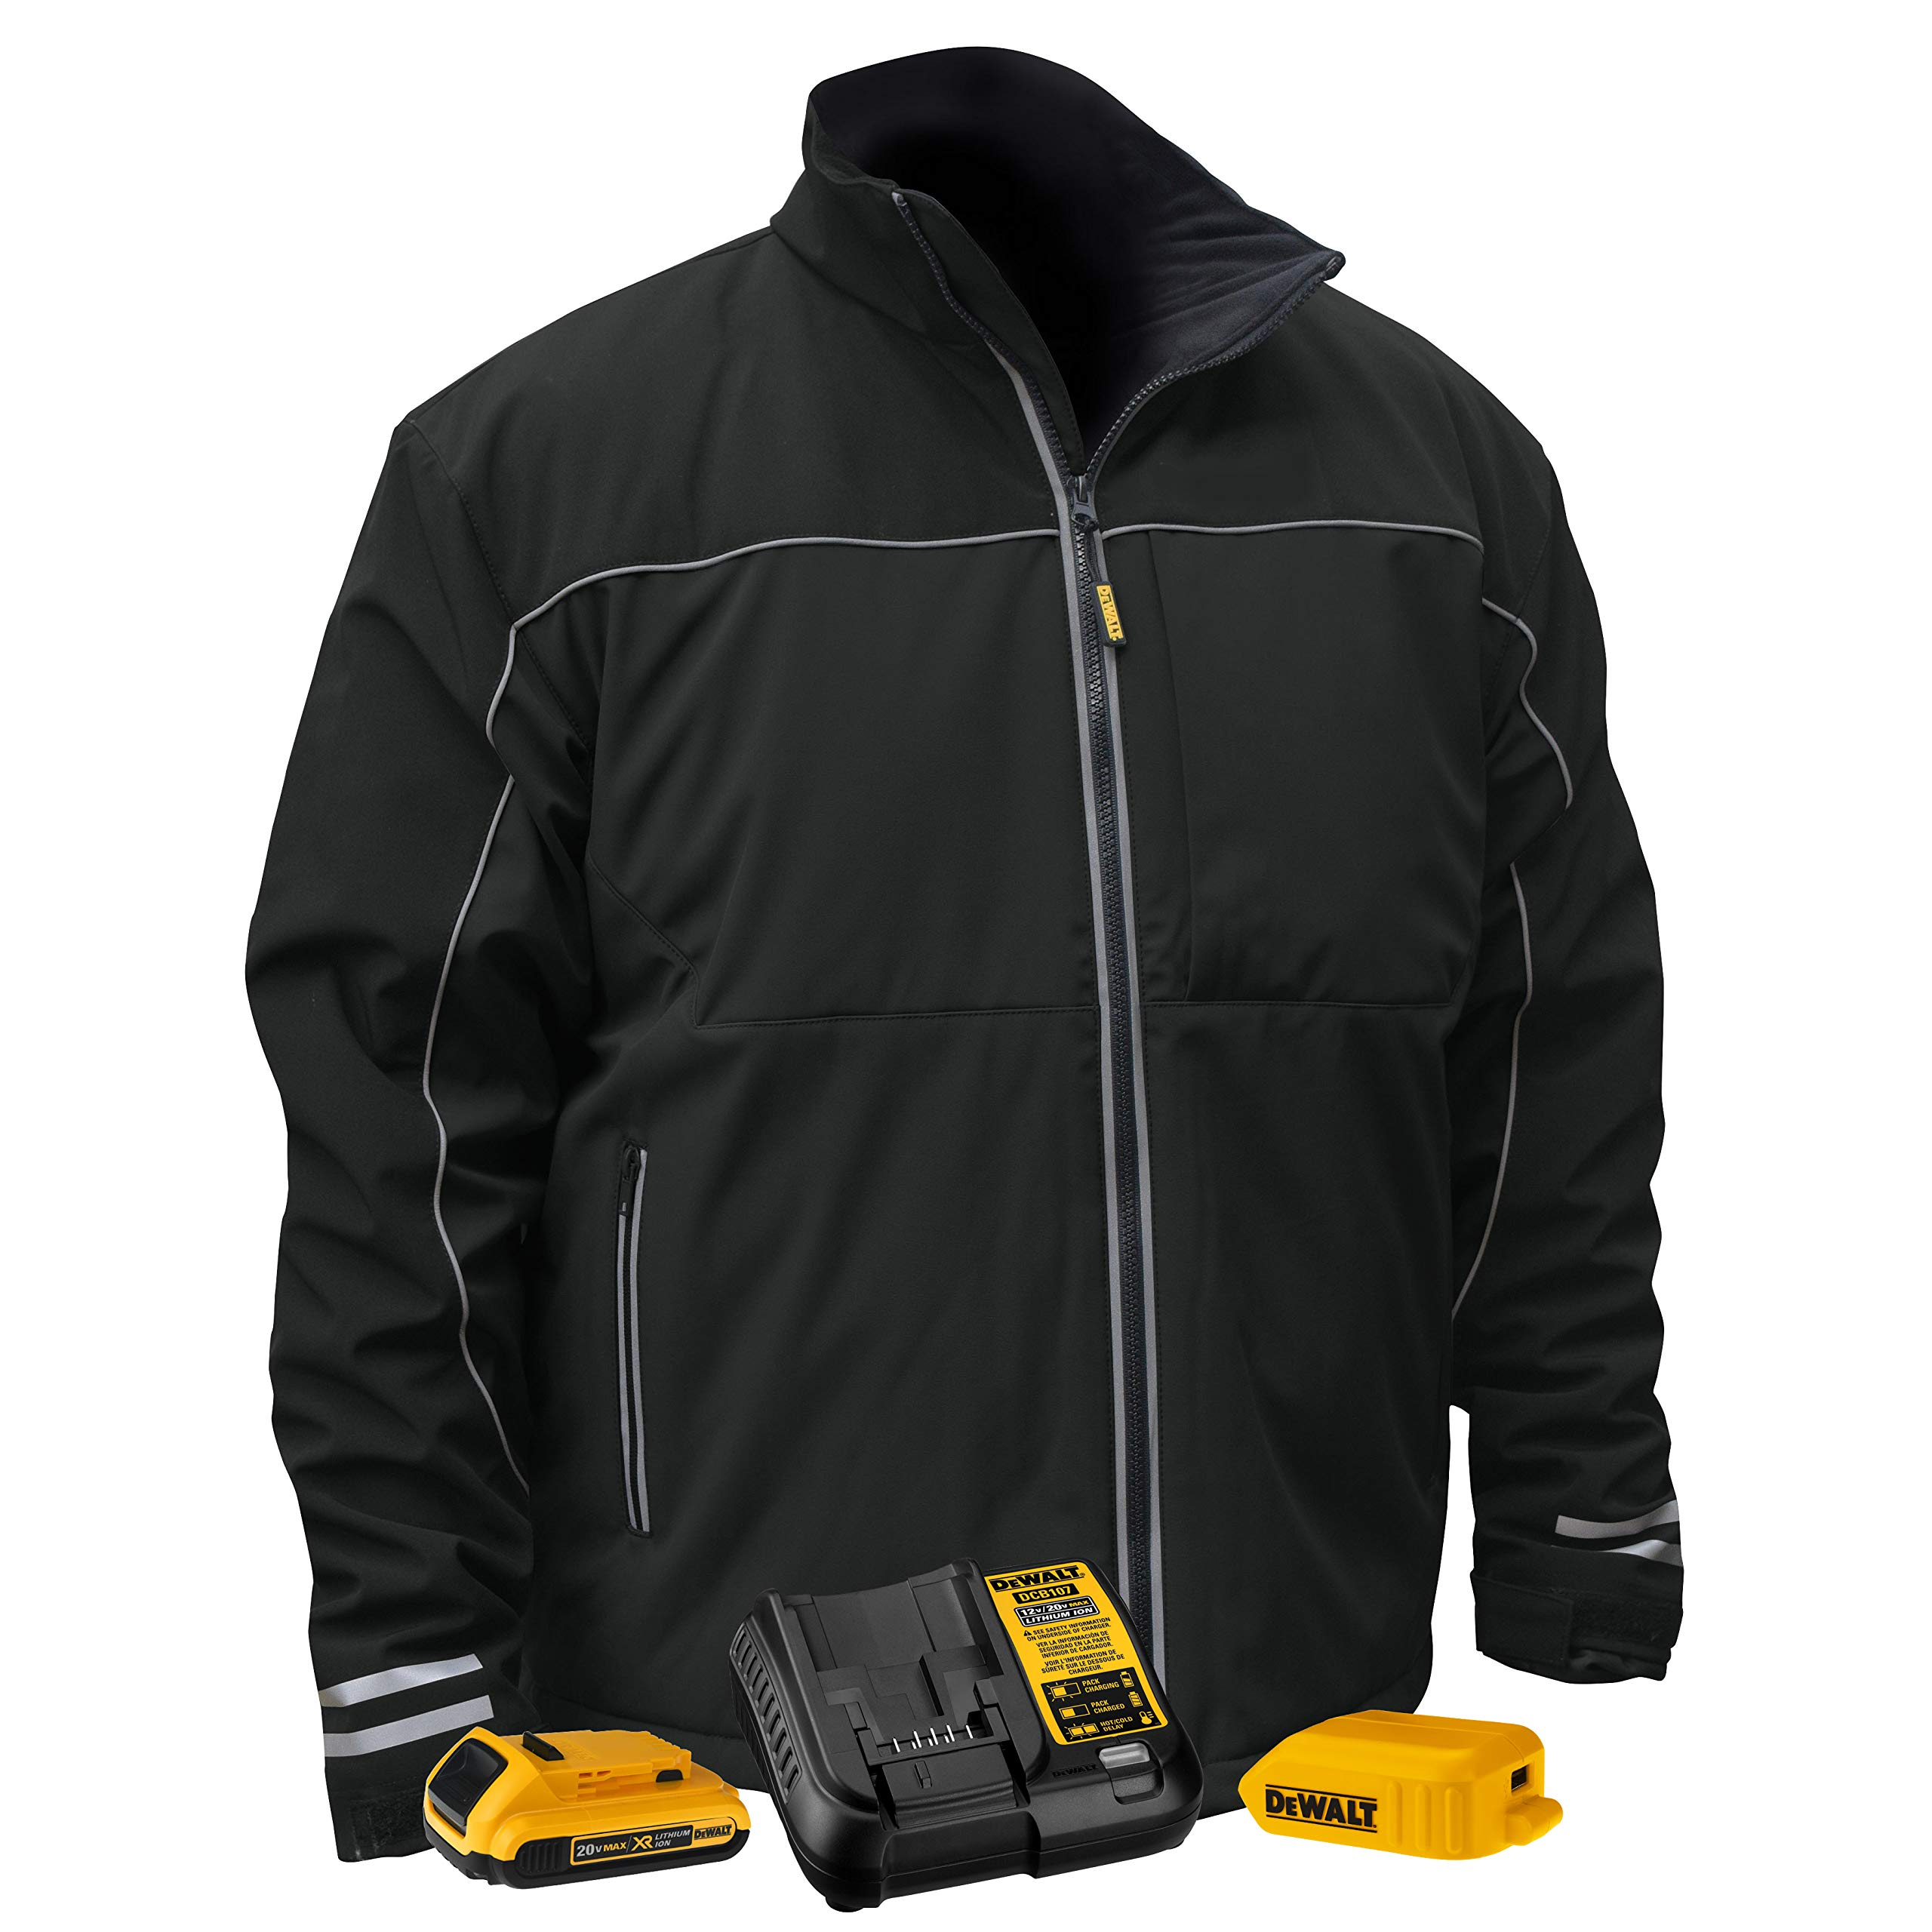 DEWALT DCHJ072D1-2X Heated Lightweight Soft Shell Jacket, 2X, Black